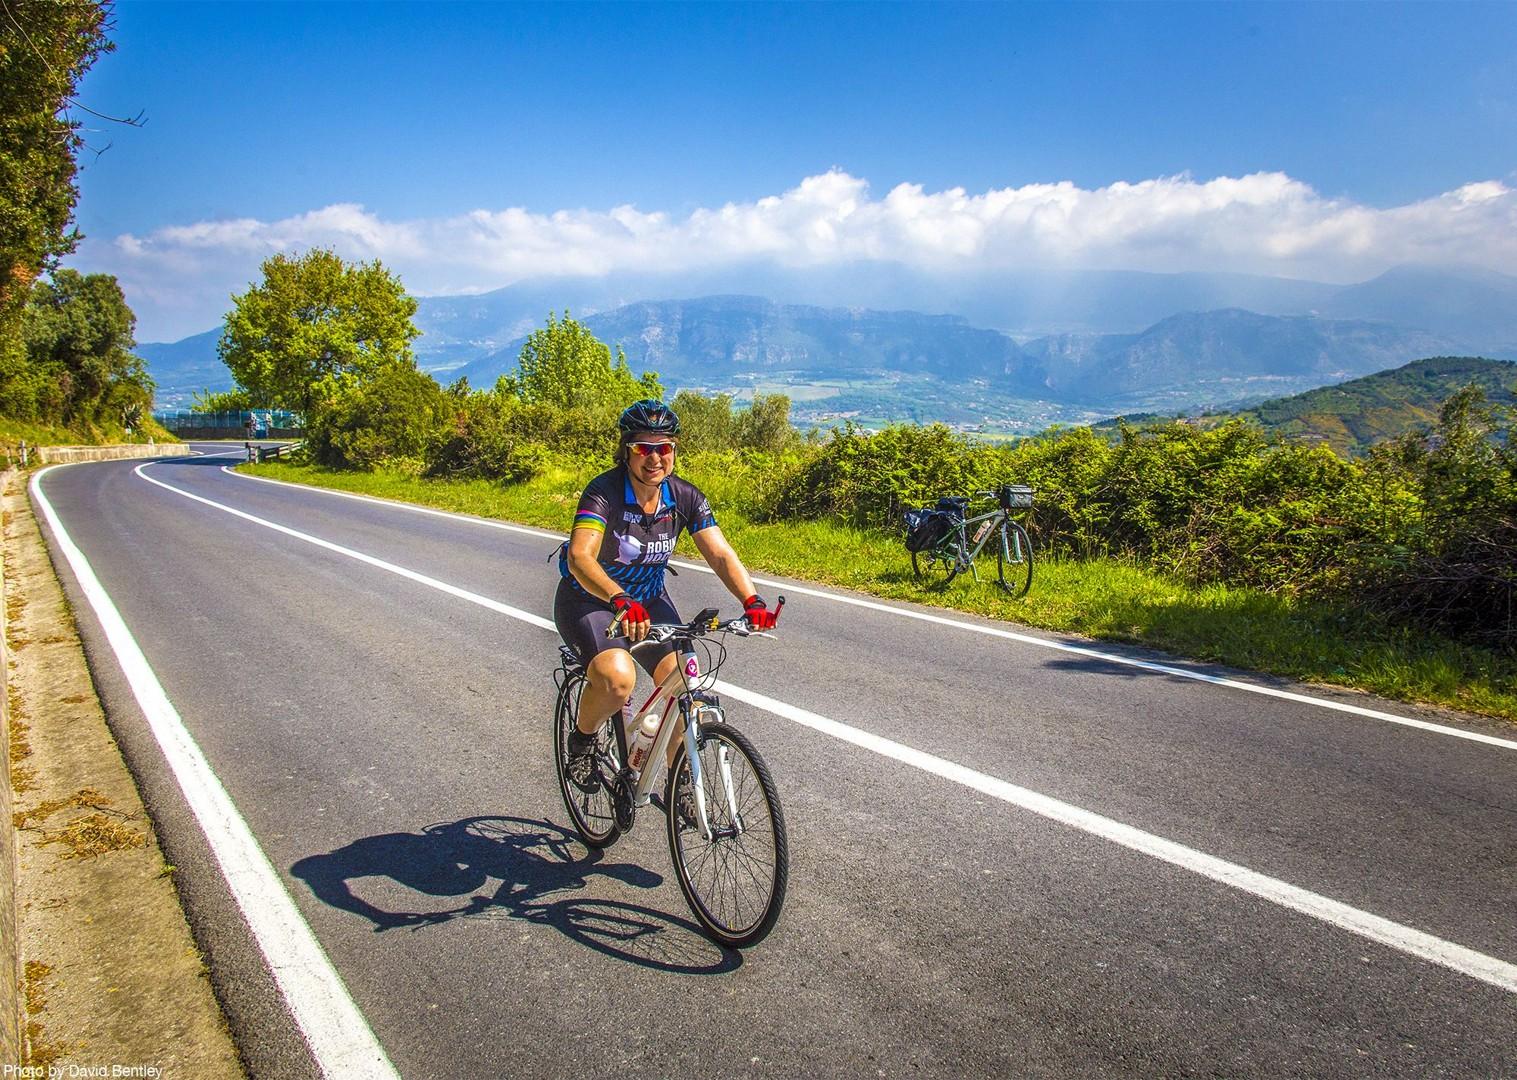 2017 Amalfi Coast_0140-2.jpg - Italy - Cilento and The Amalfi Coast - Self-Guided Leisure Cycling Holiday - Italia Leisure and Family Cycling